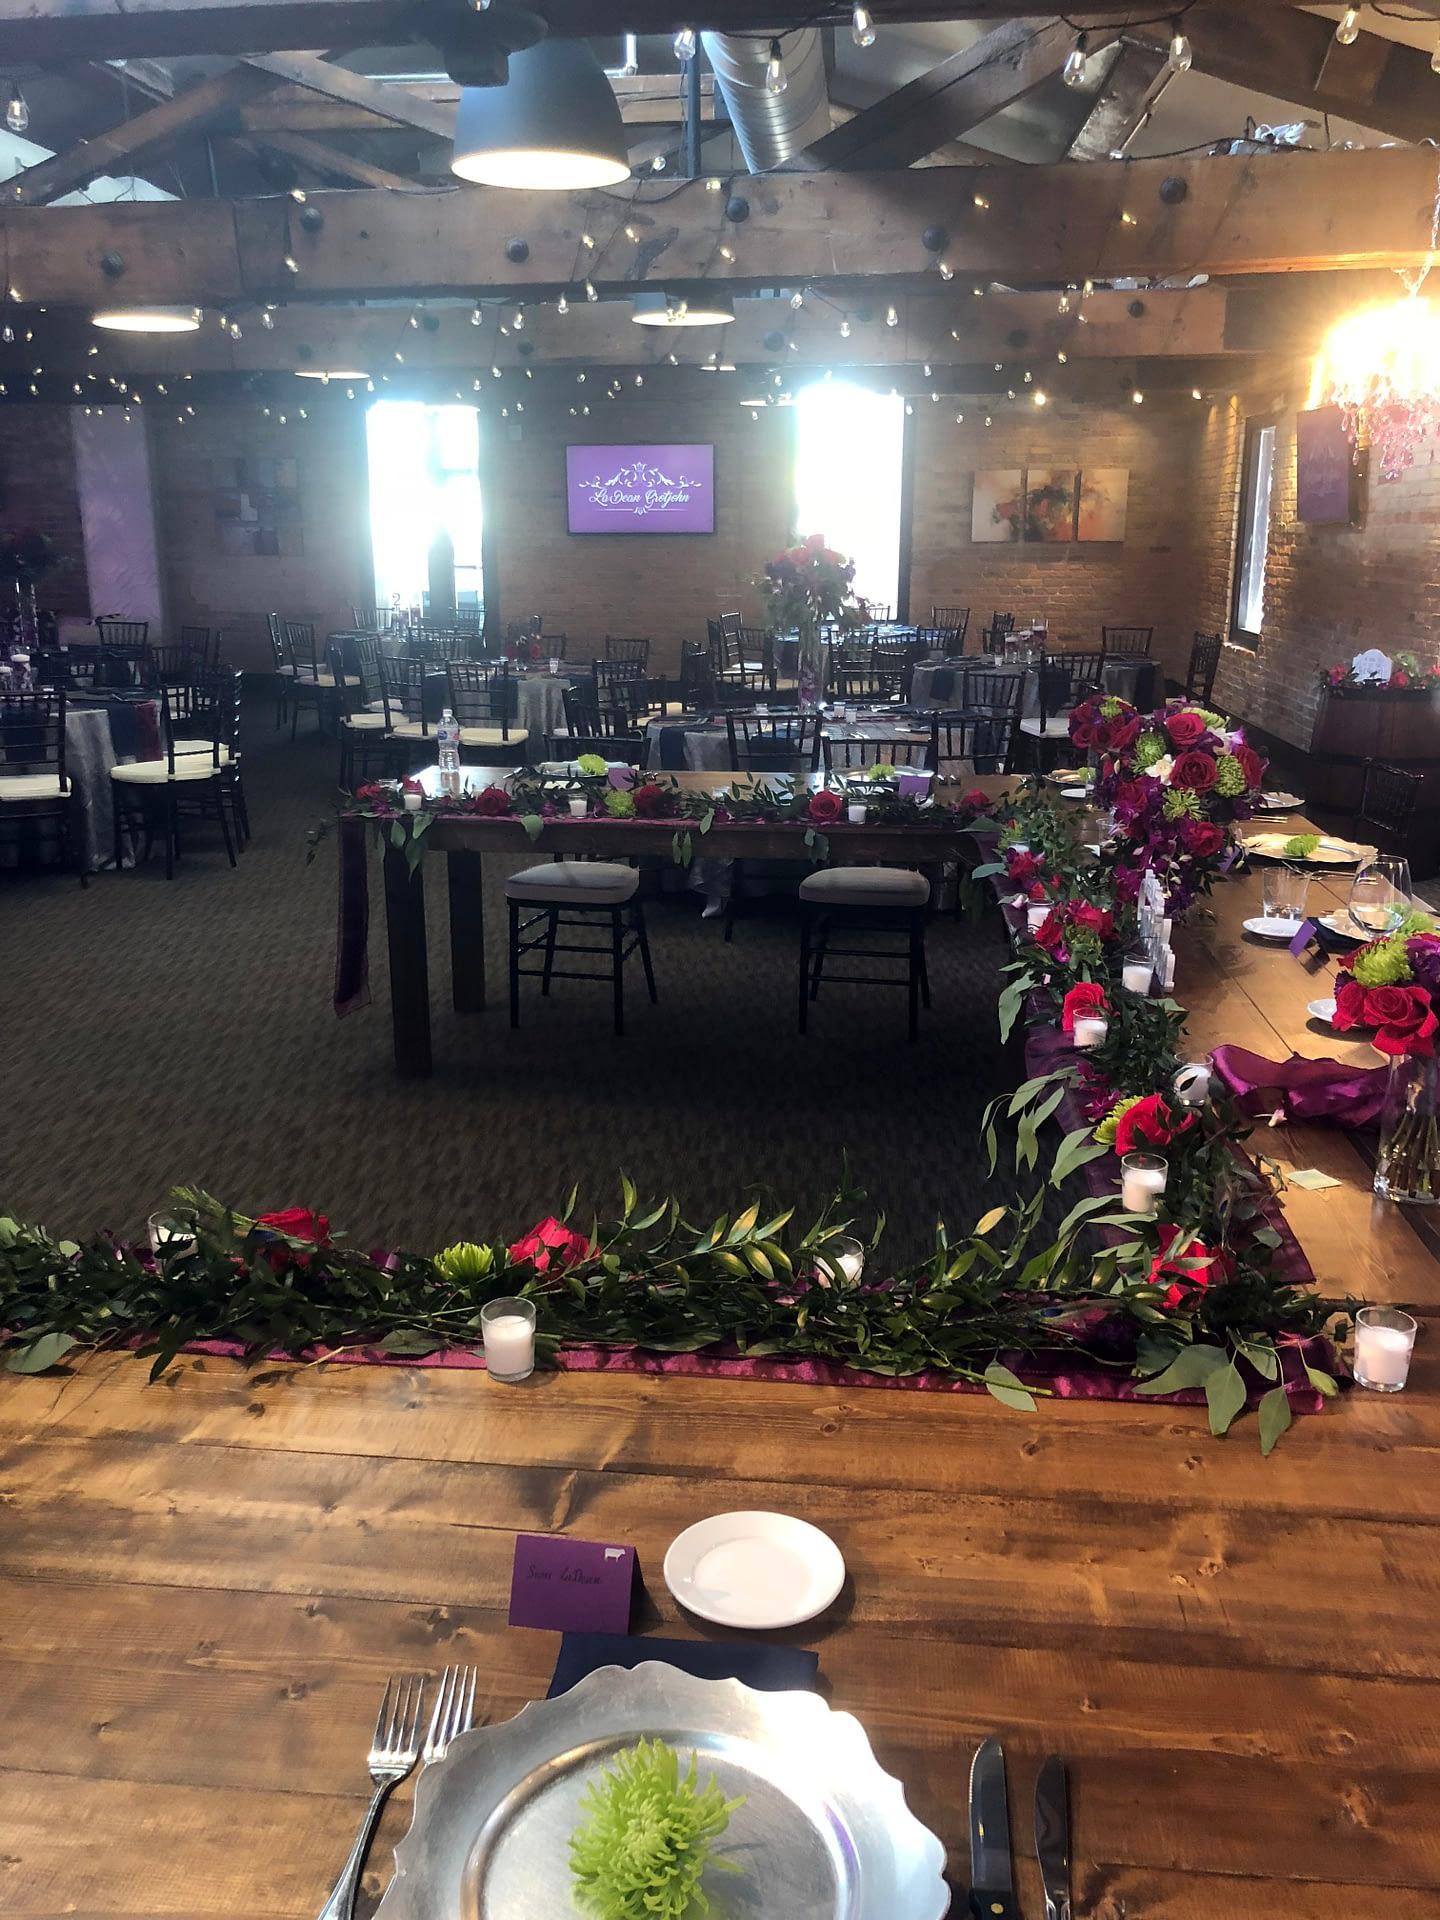 minneapolis event center reception decoration greenery flowers warm